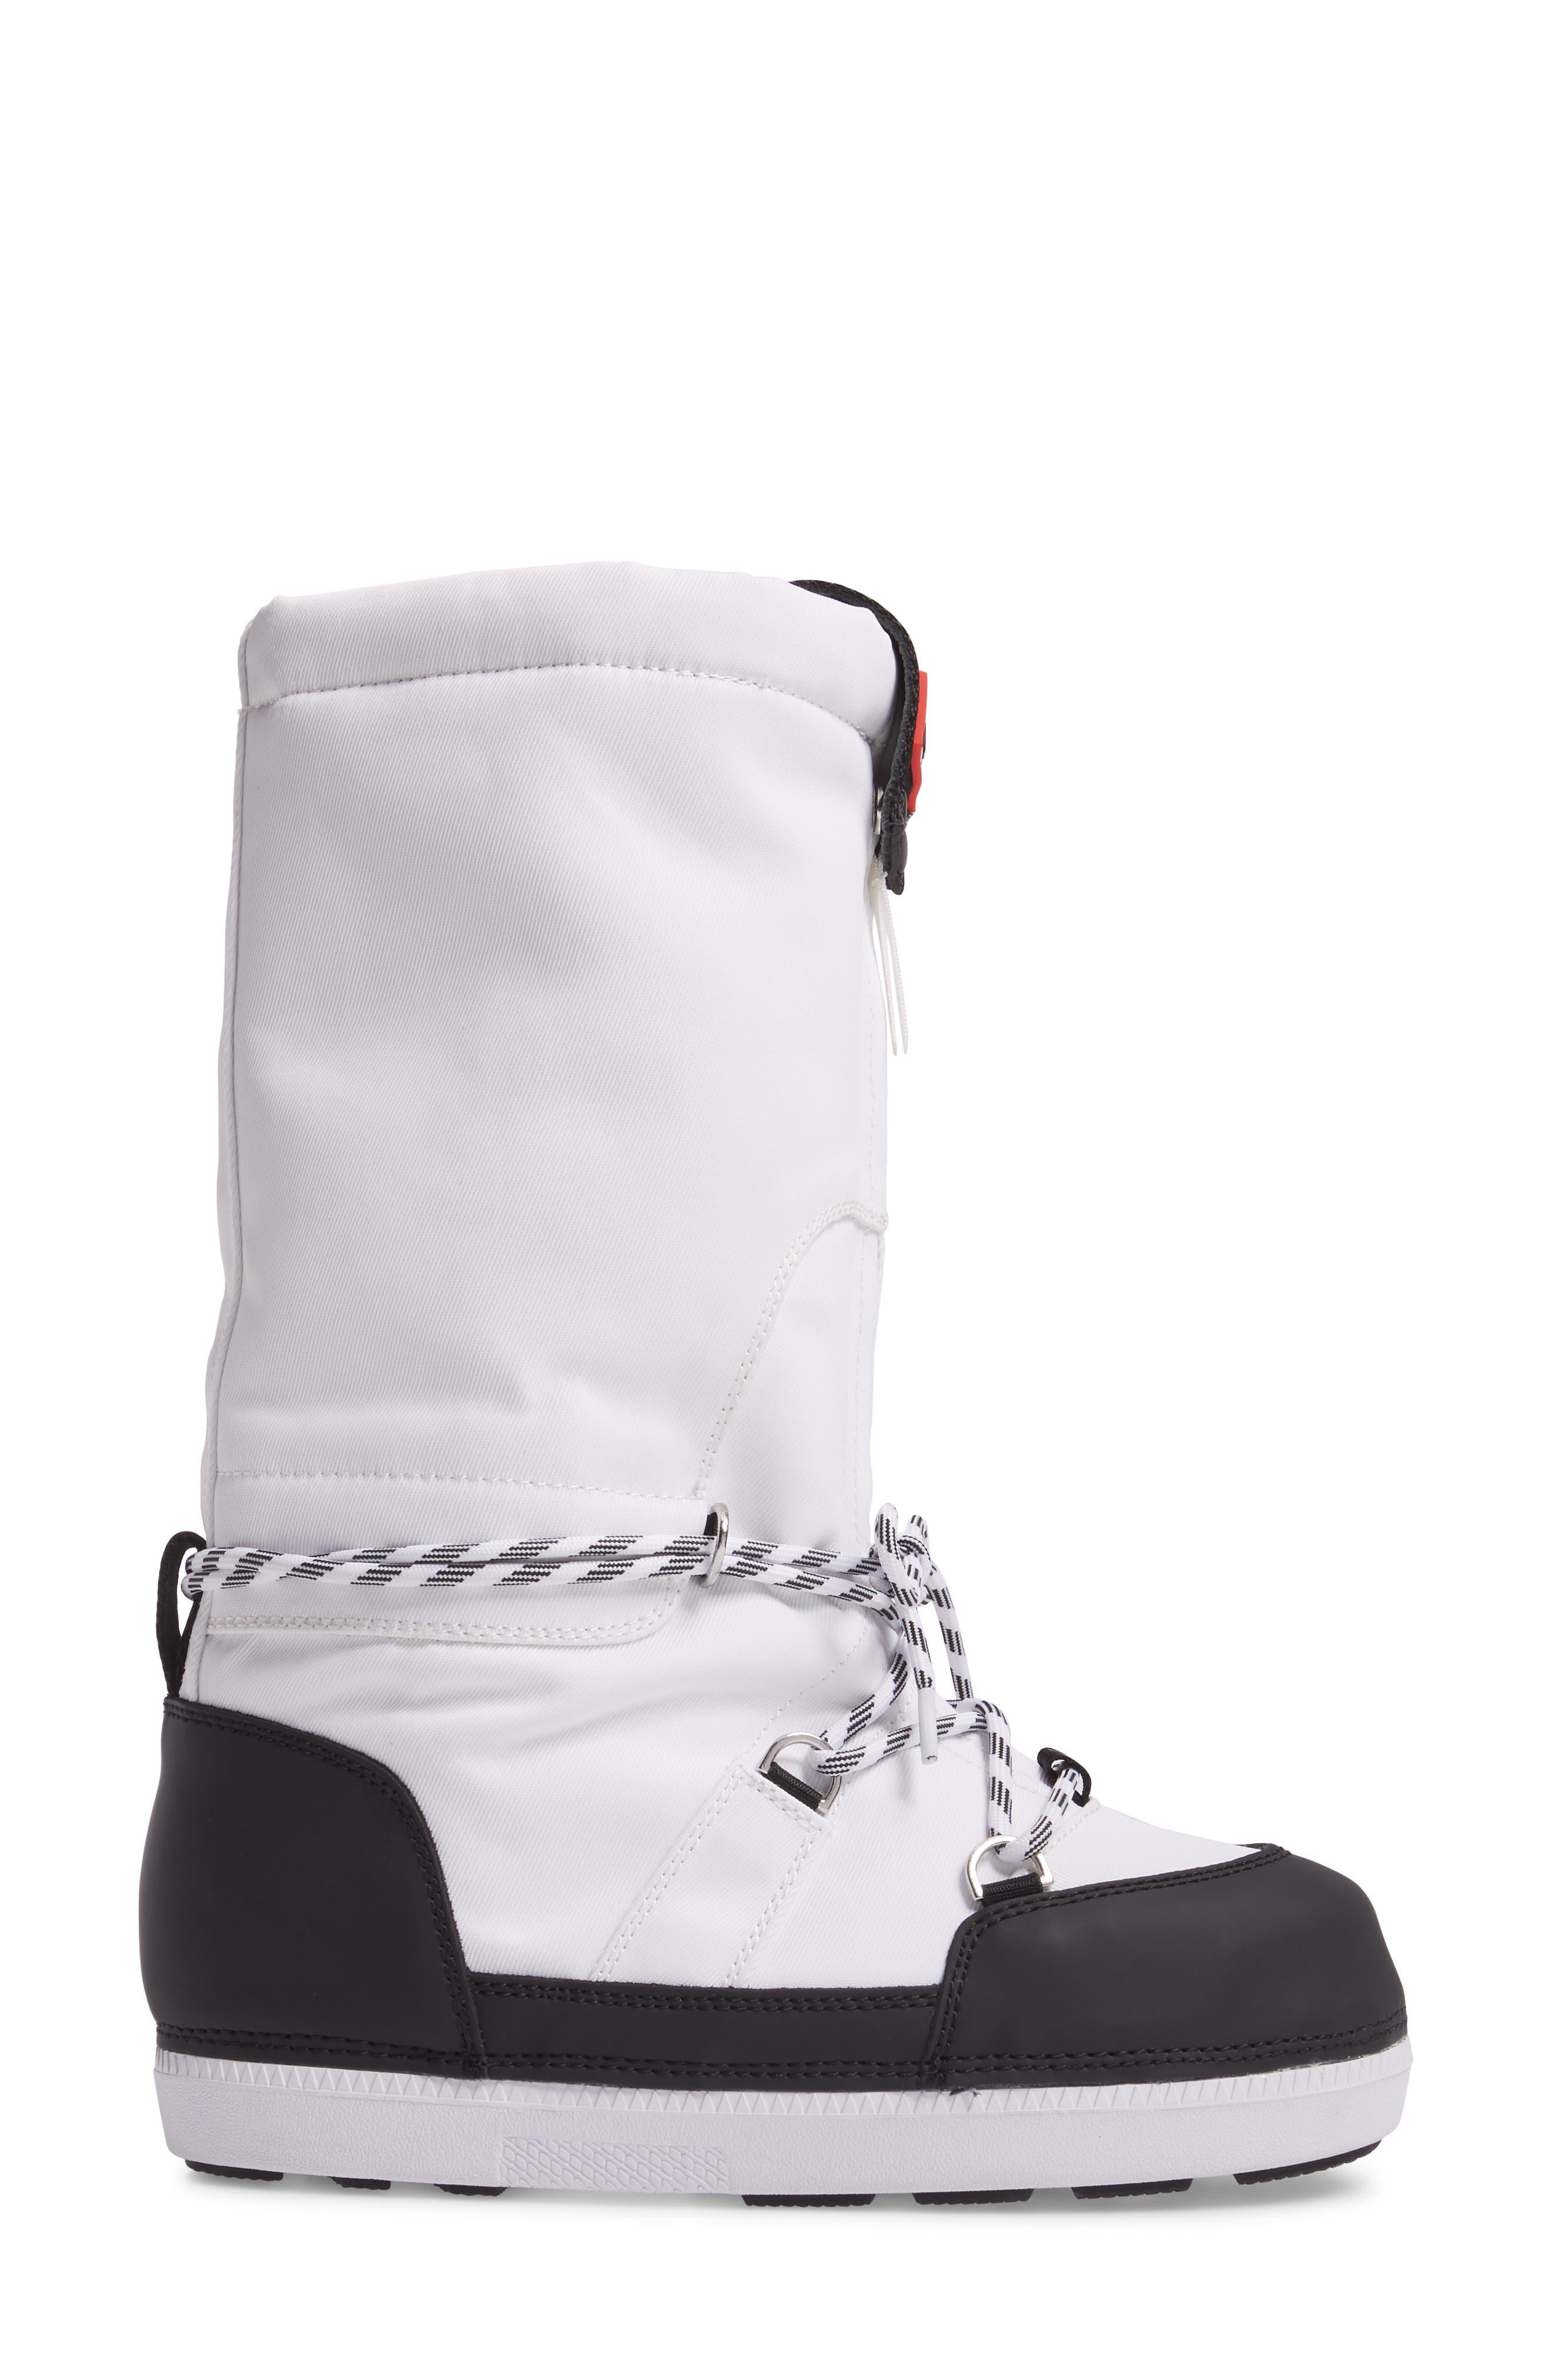 Alternate Image 2  - Hunter Original Waterproof Snow Boot (Women)